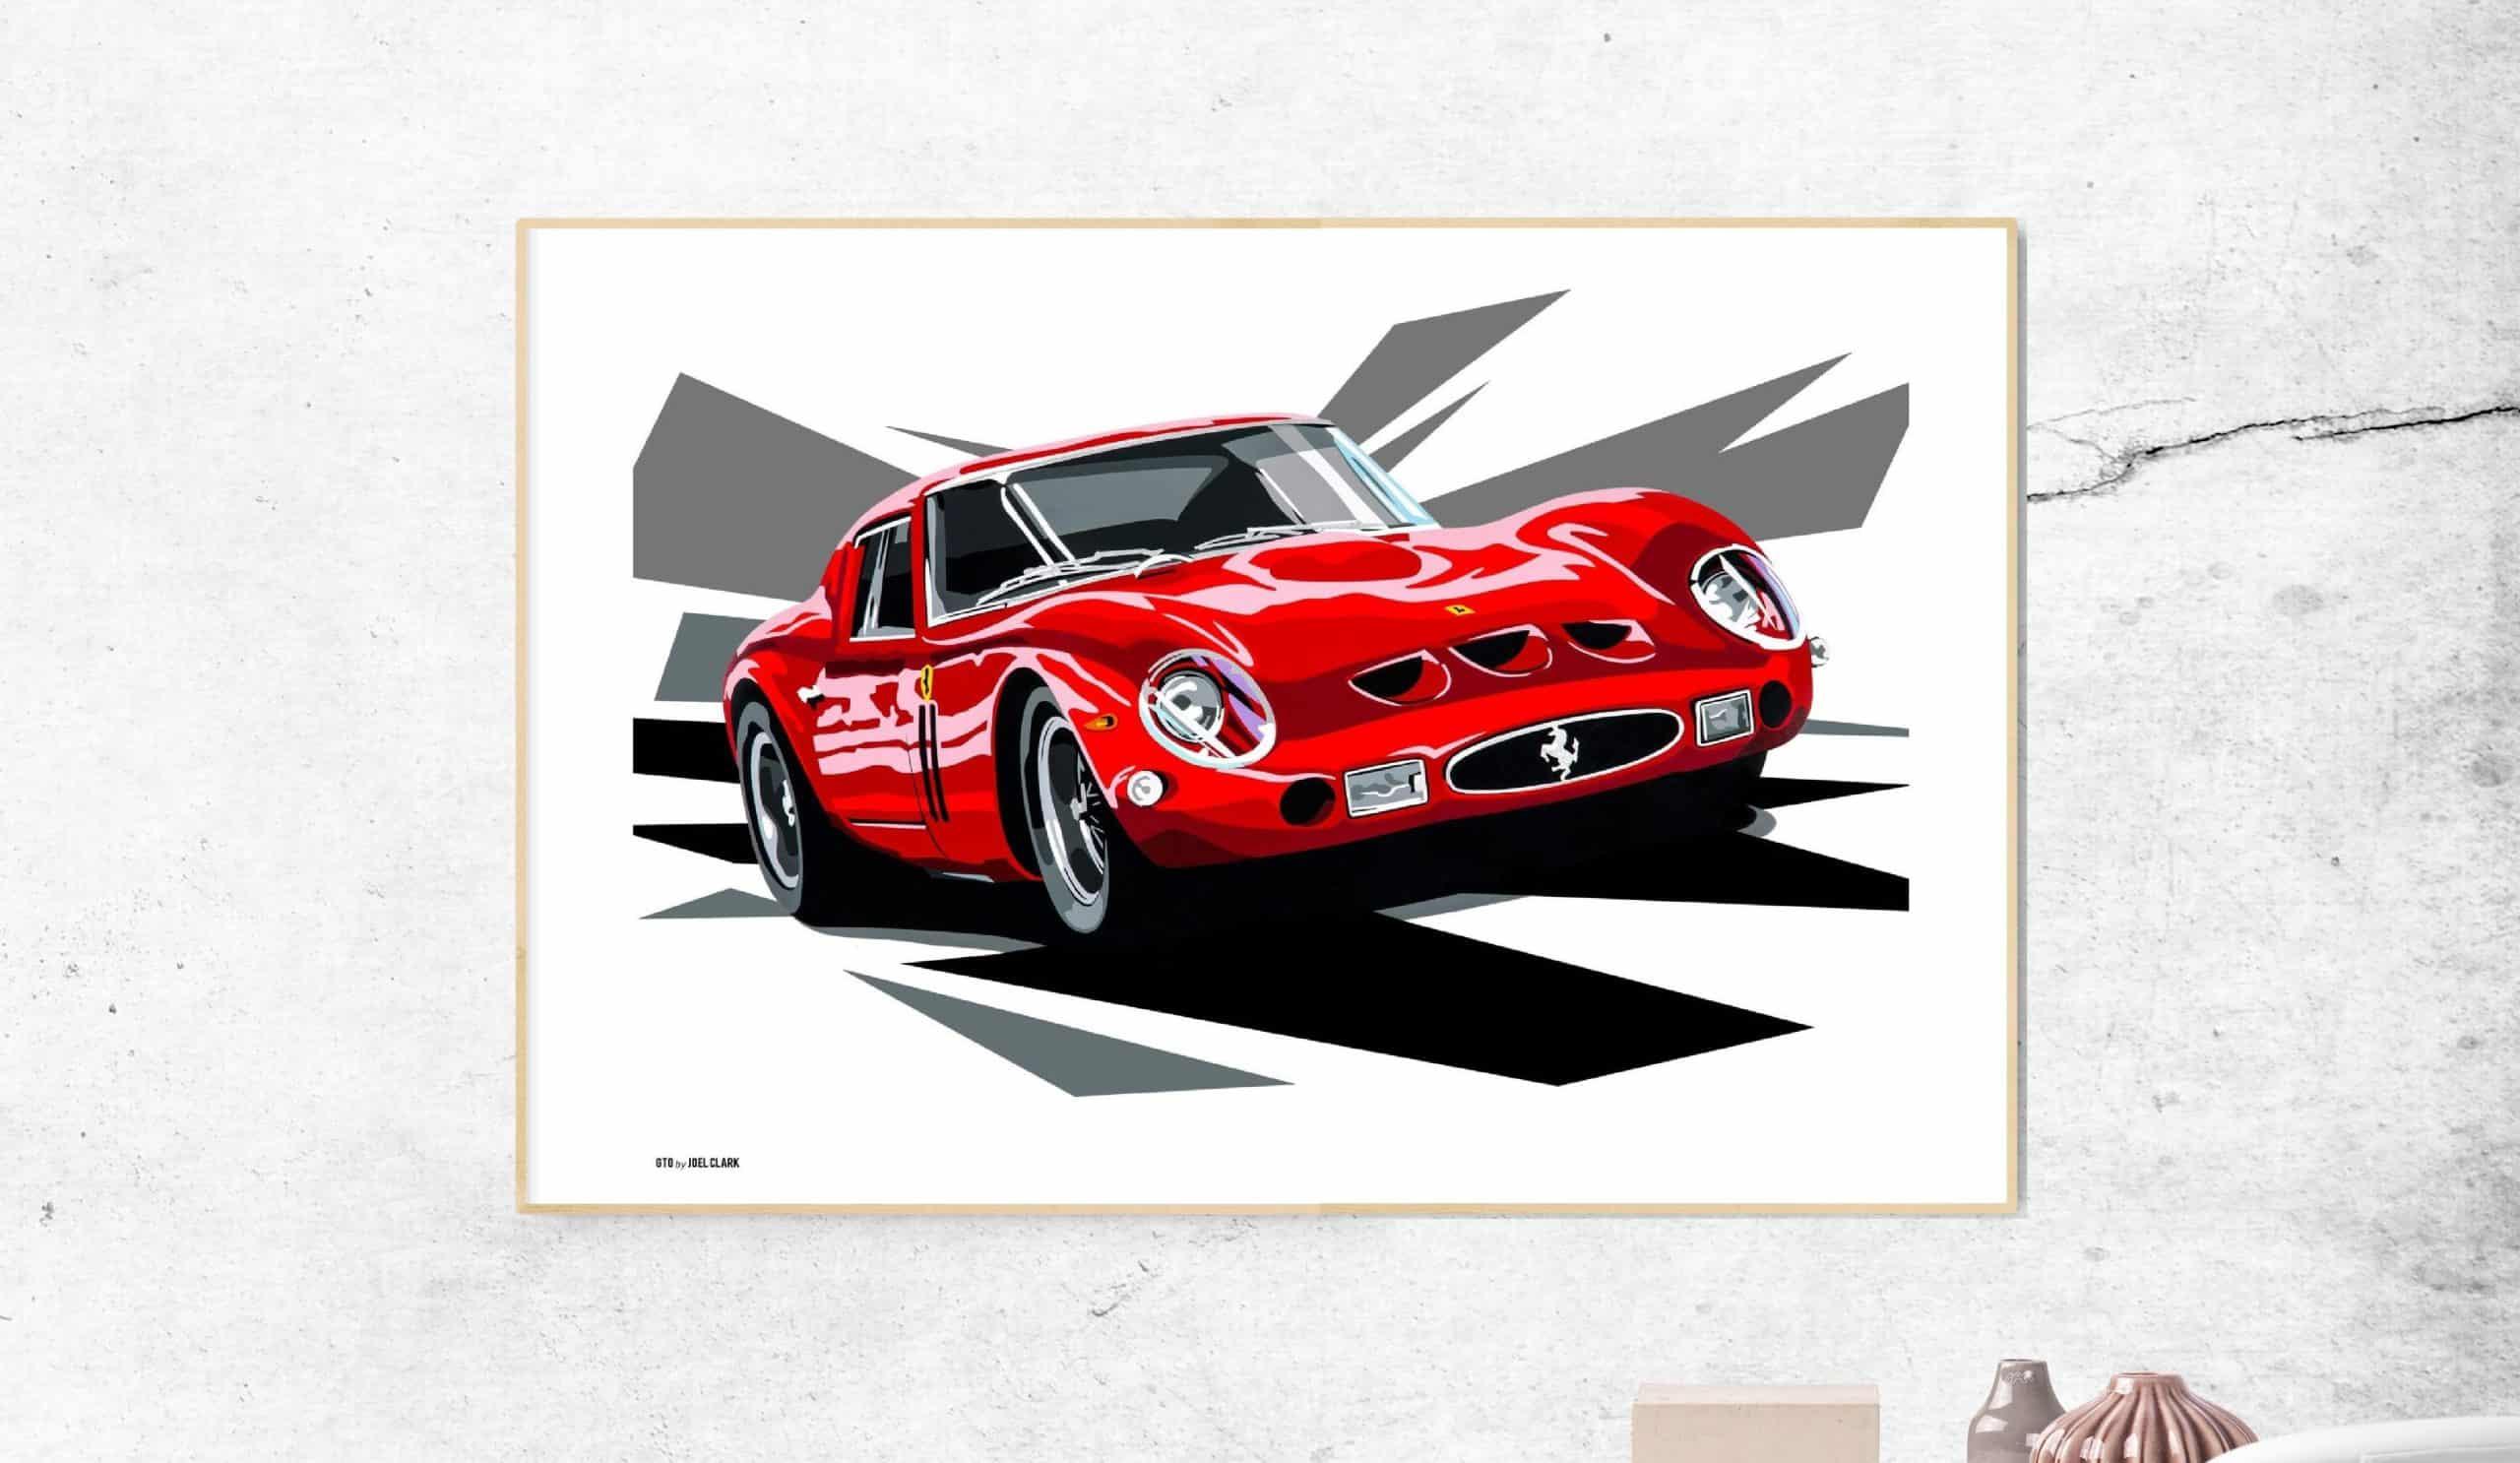 Wall_frame_Ferrari-GTO-schilderij-art